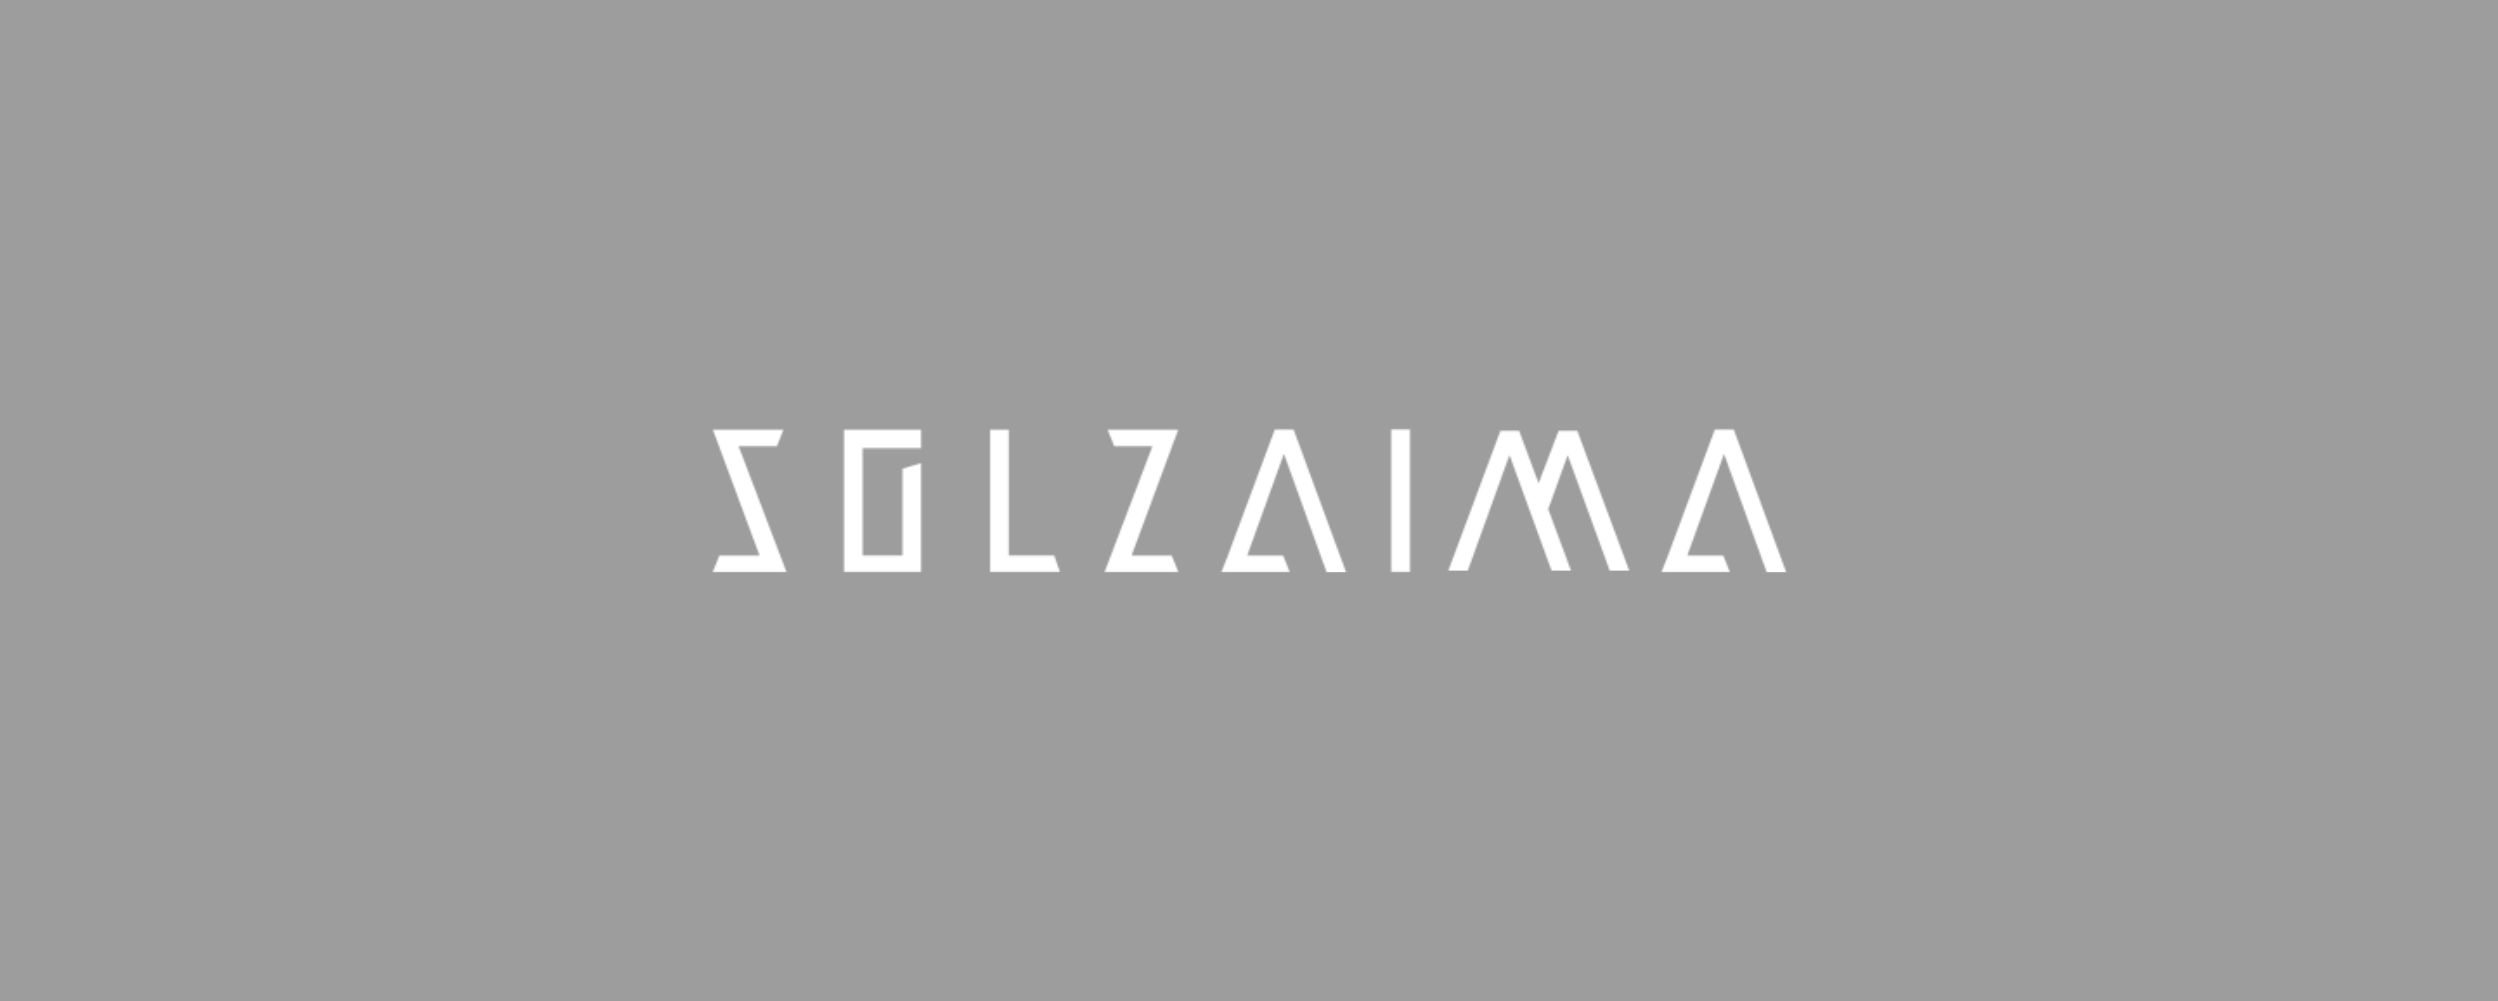 Logotipo da Solzaima